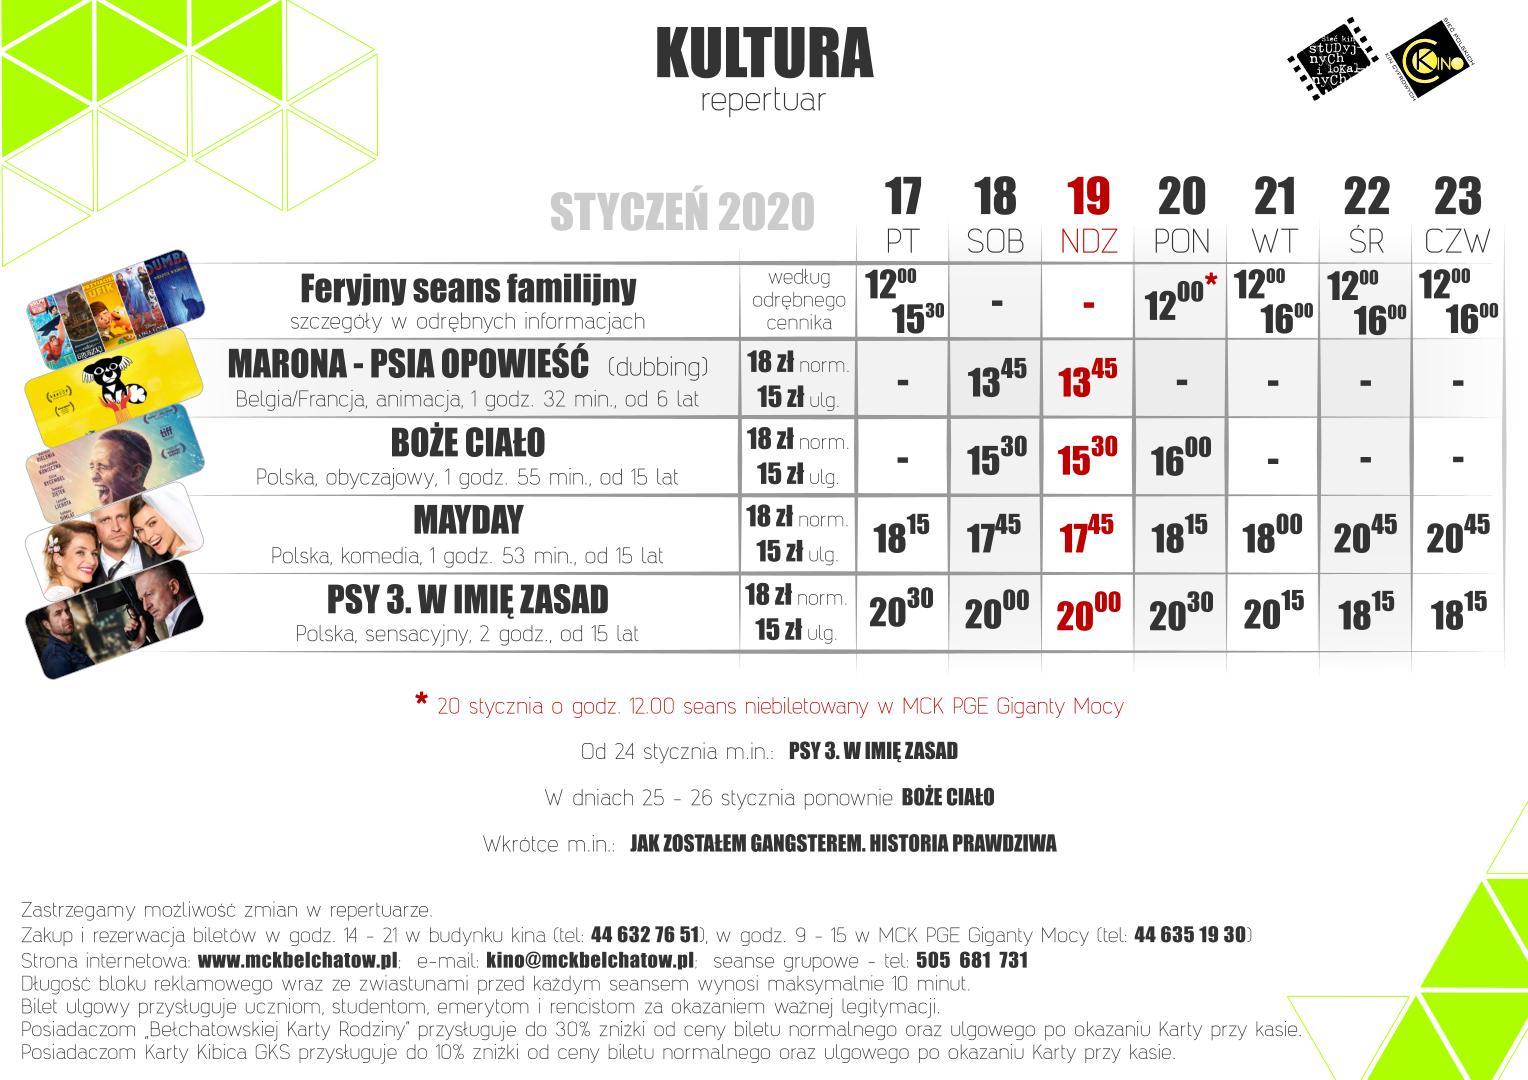 https://www.mckbelchatow.pl/kino-kultura/repertuar/2020/01/3/kultura-repertuar-2020-01-17_ekran.jpg